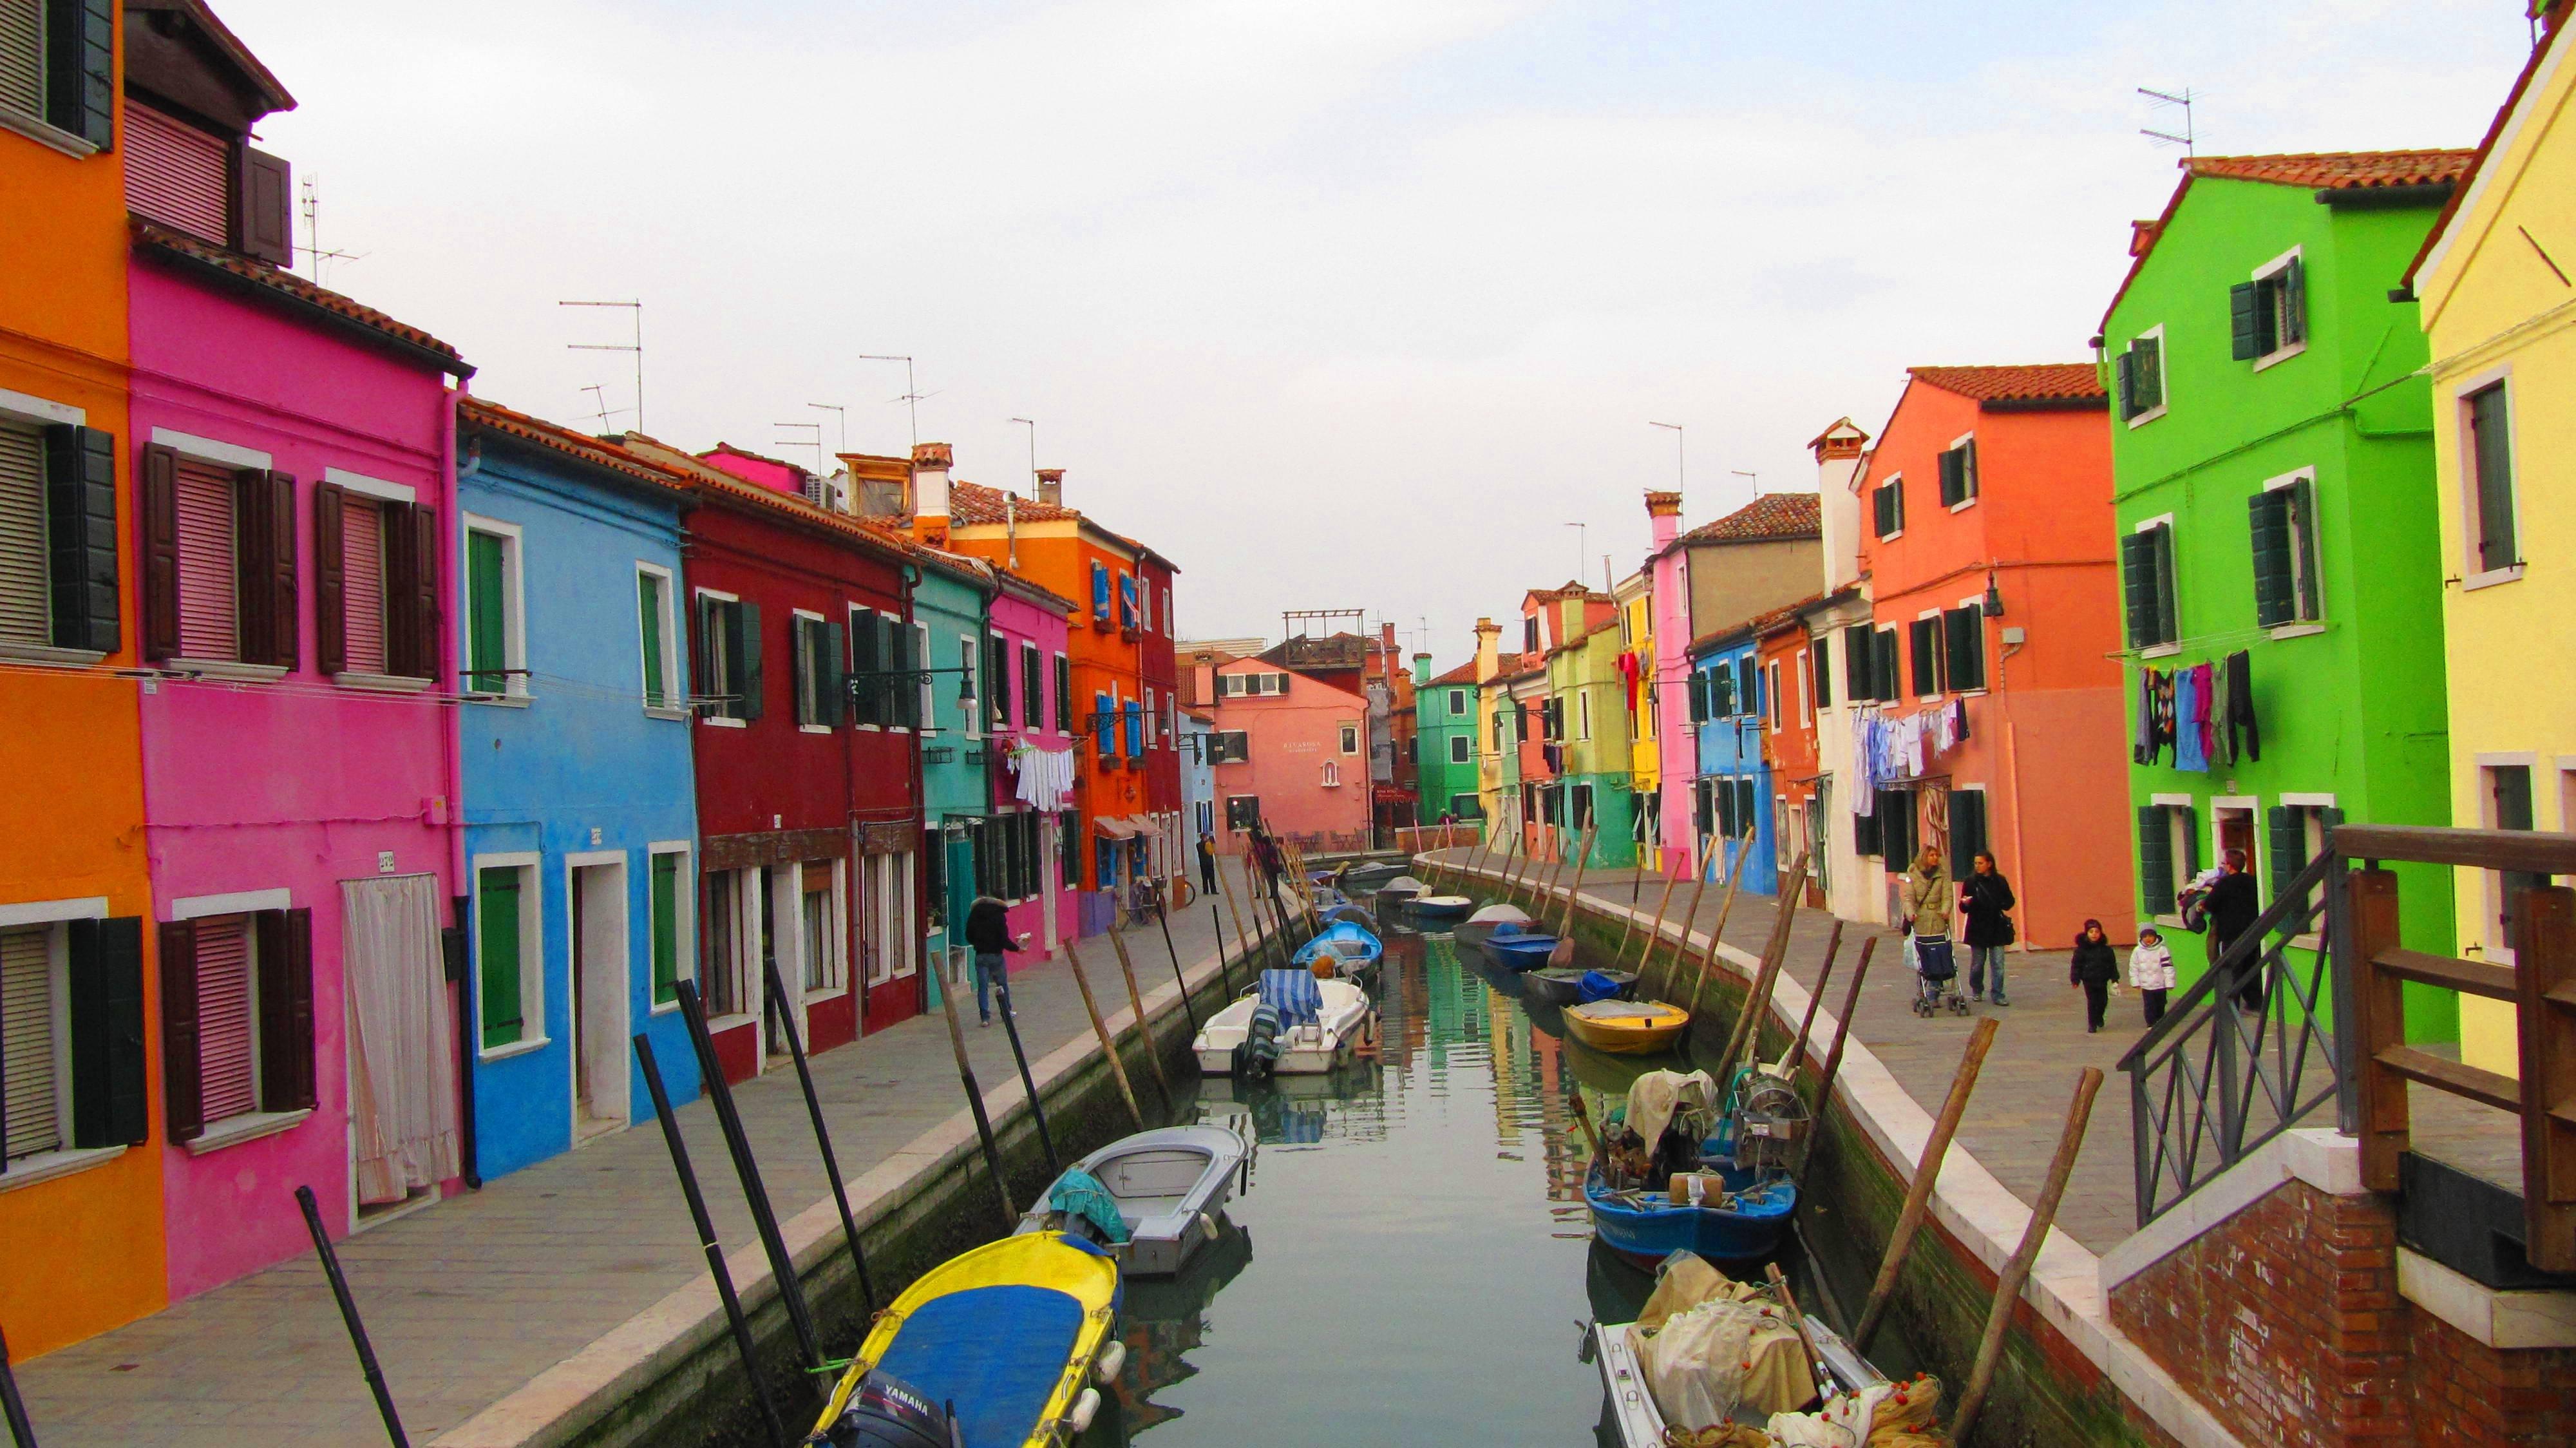 Colorful burano italy burano tourism - The Colored Houses Of Burano